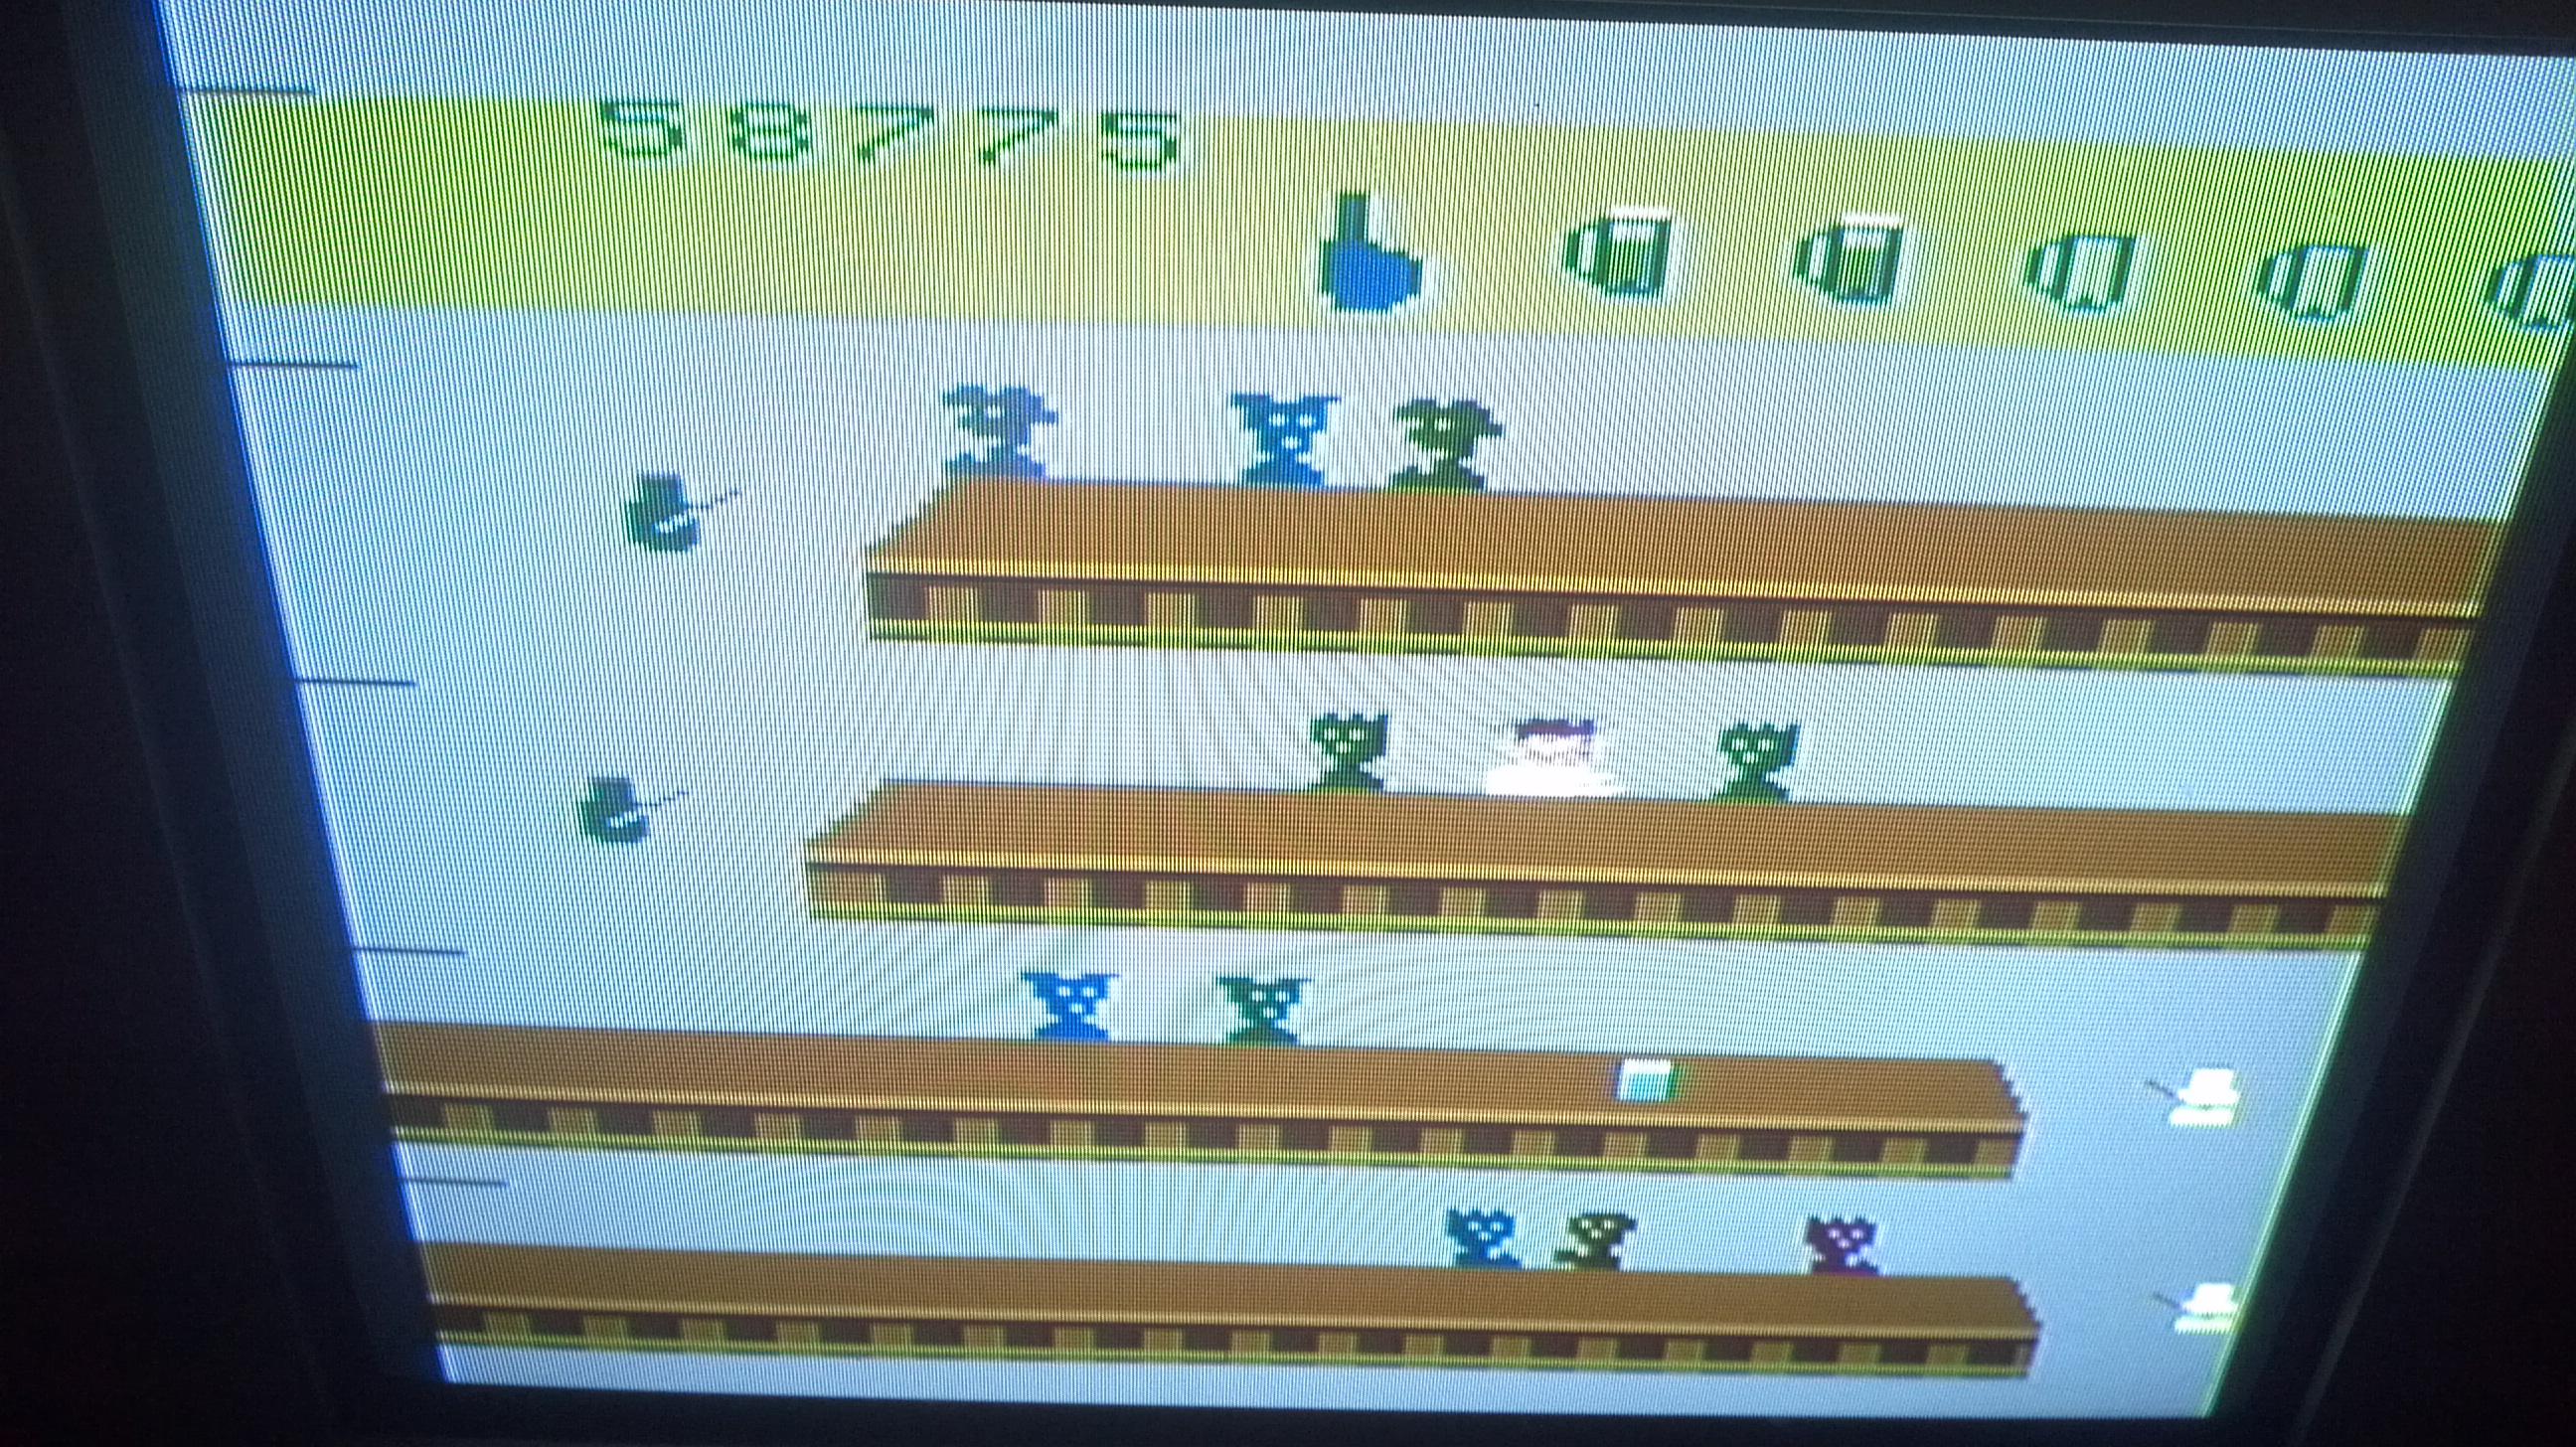 Liduario: Tapper (Atari 2600 Novice/B) 58,775 points on 2014-05-04 12:08:34